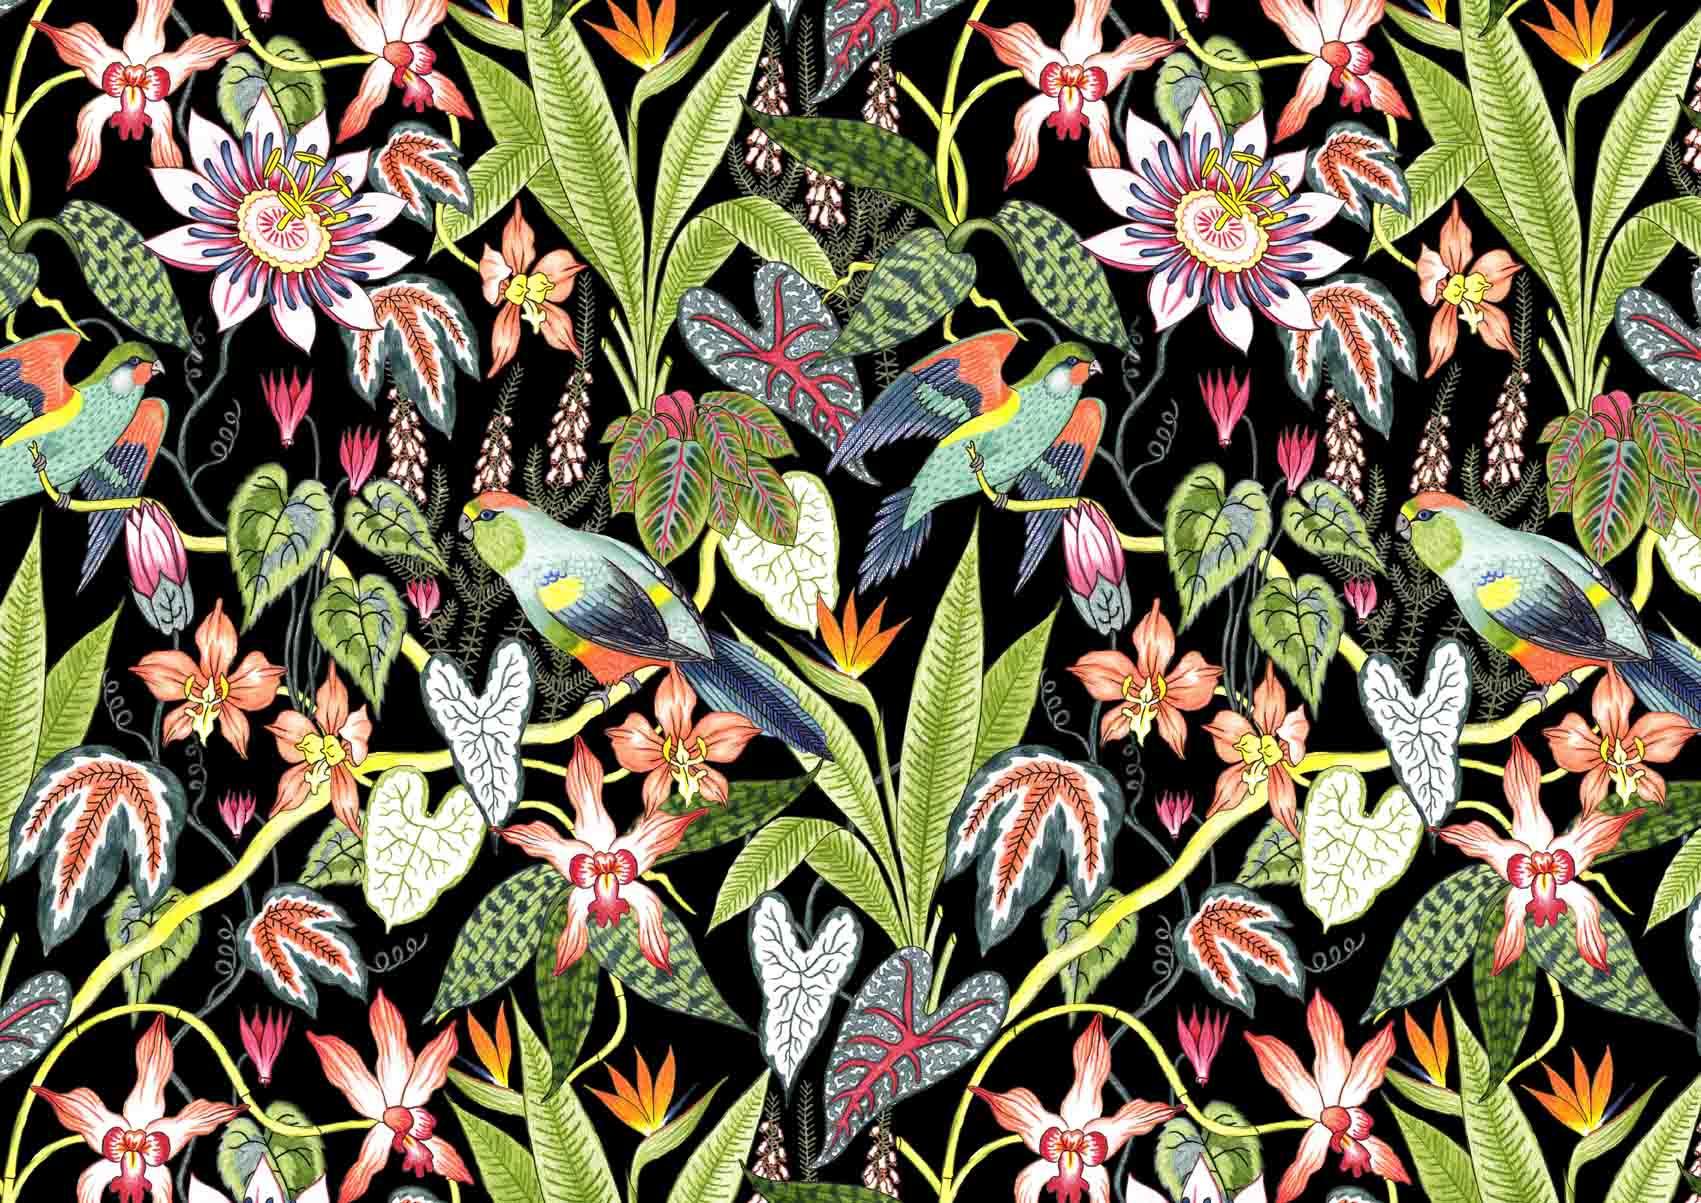 Derwent-Tropical-Pencil-set-Illustration-Pattern-Jacqueline-Colley-1.jpg